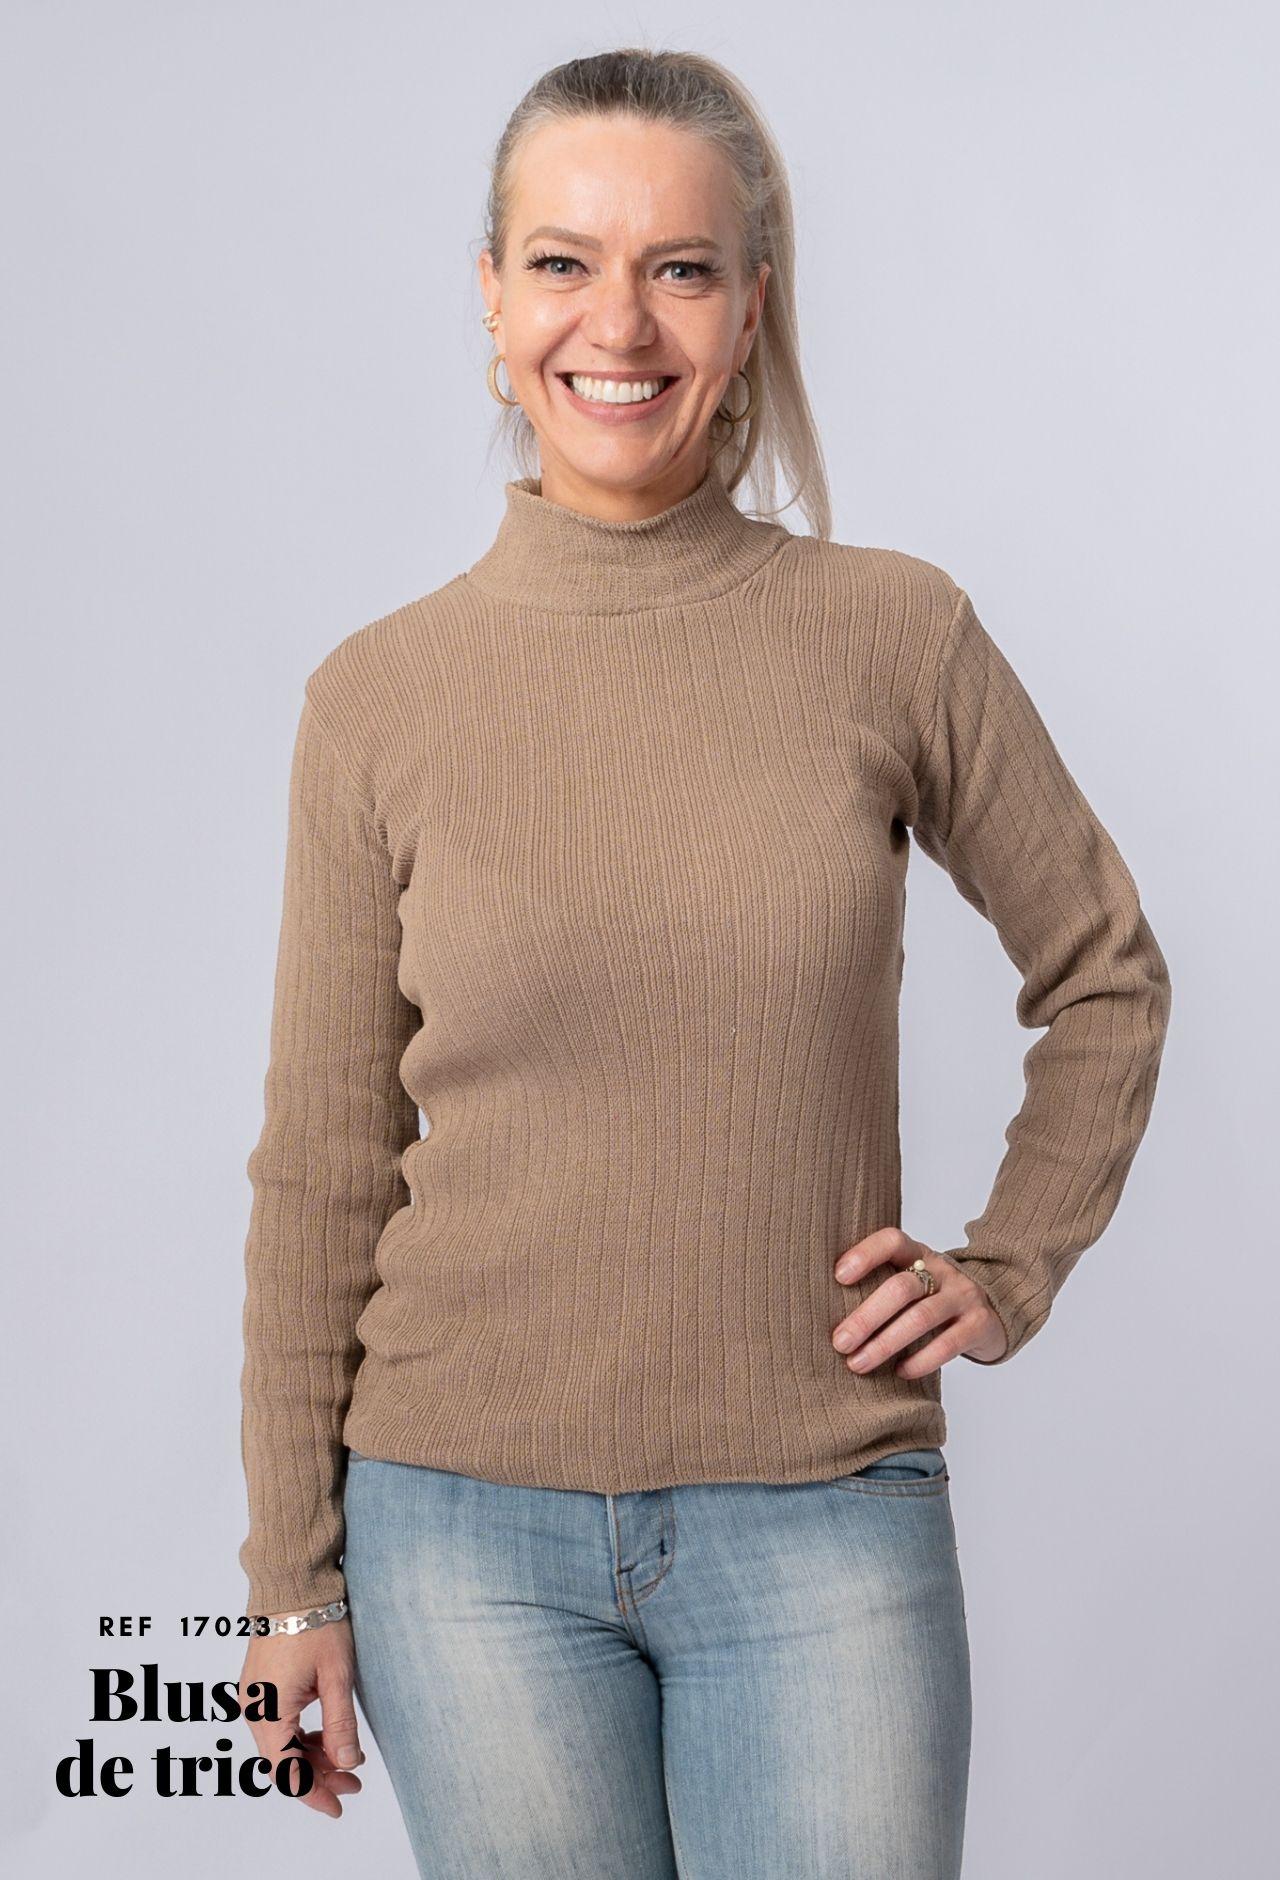 Blusa Trico